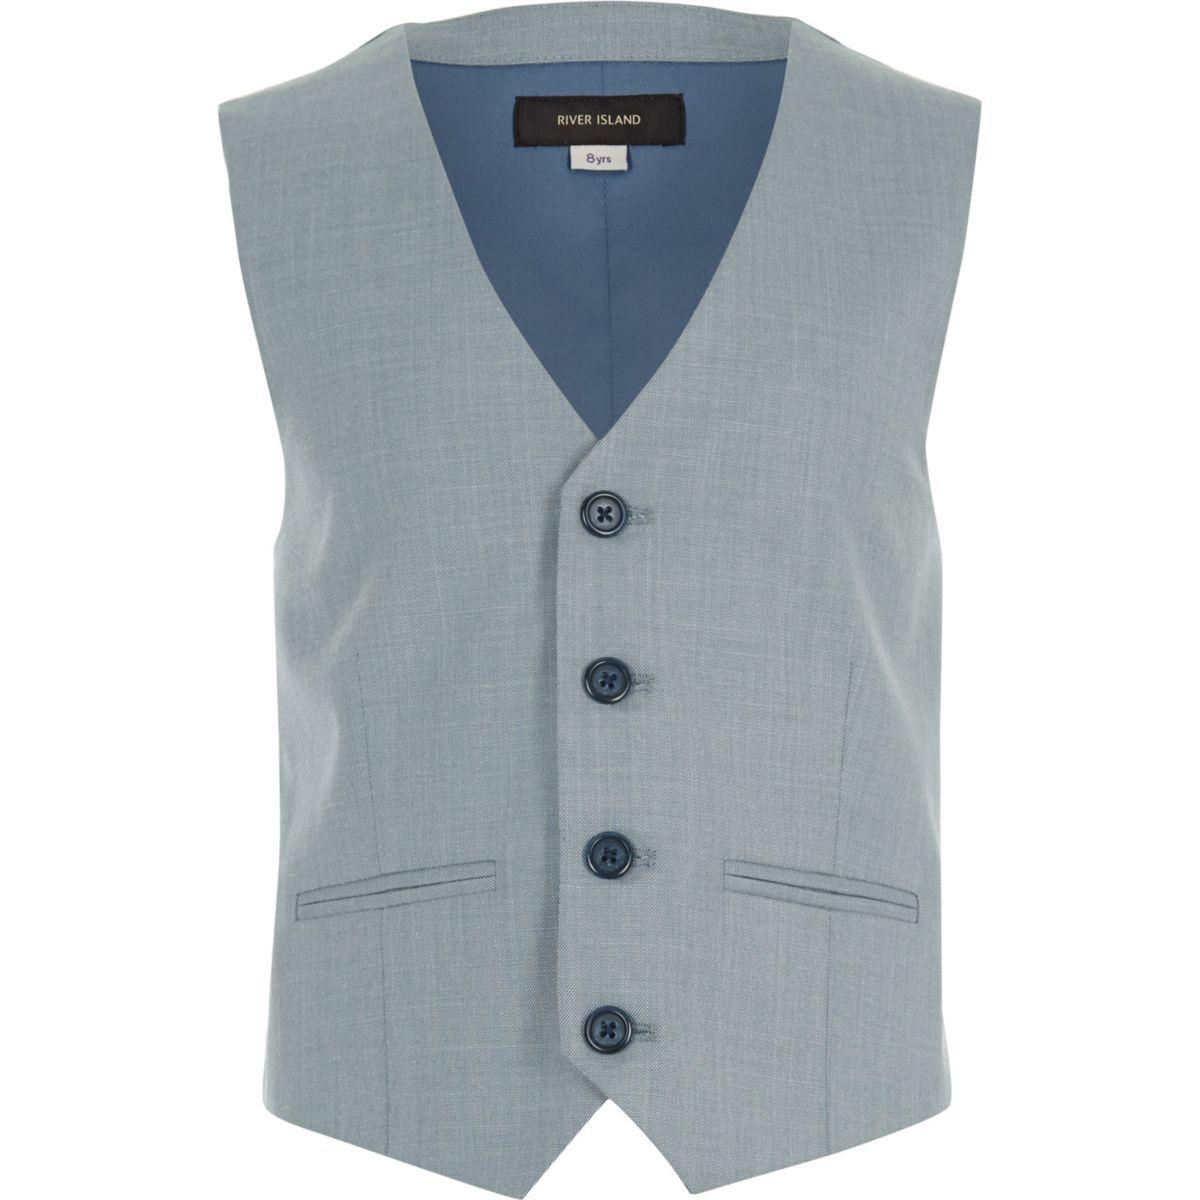 Boys light blue suit waistcoat